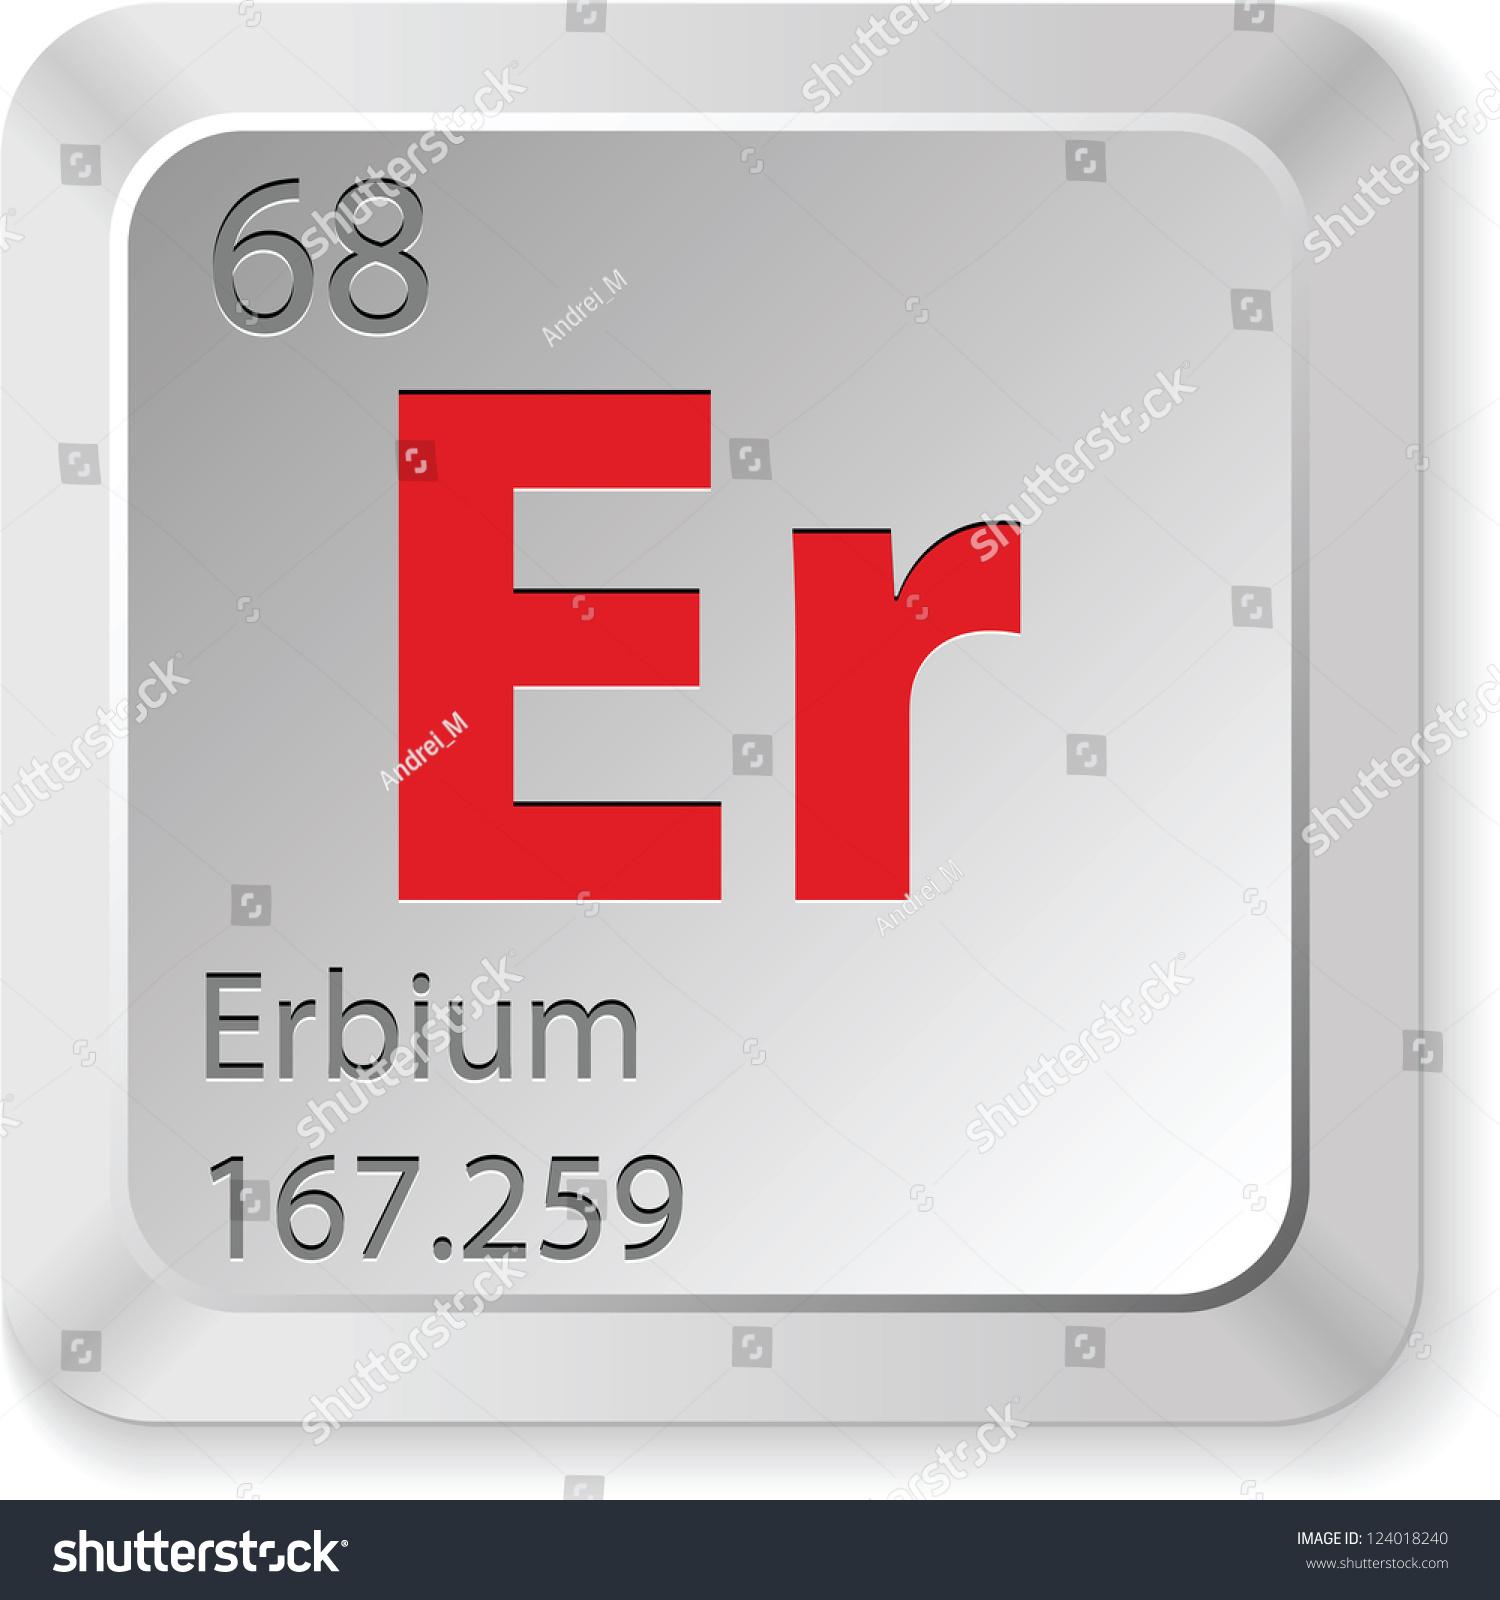 Er element crane humidifier no mist er element periodic table images periodic table images stock vector erbium element 124018240 er element periodic gamestrikefo Image collections